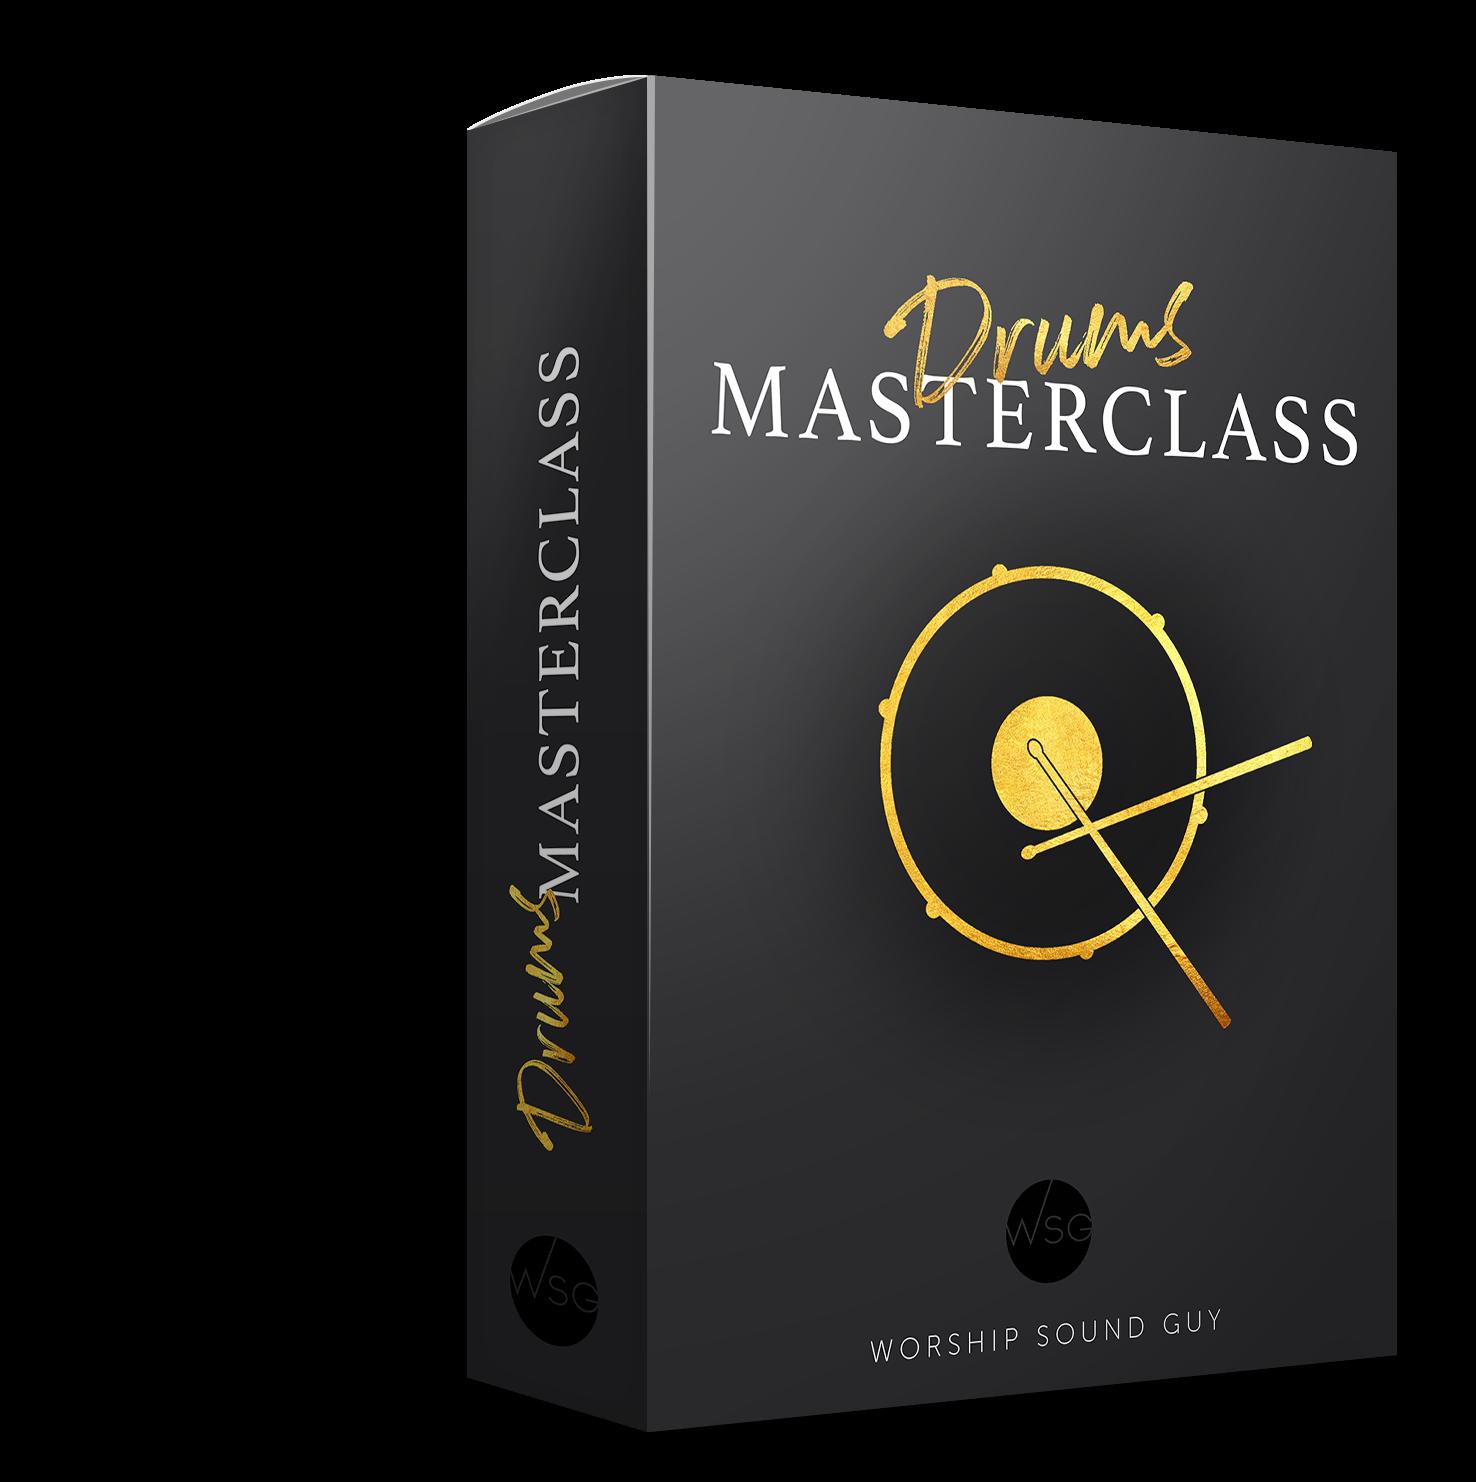 Drums Masterclass Box Mockup.png